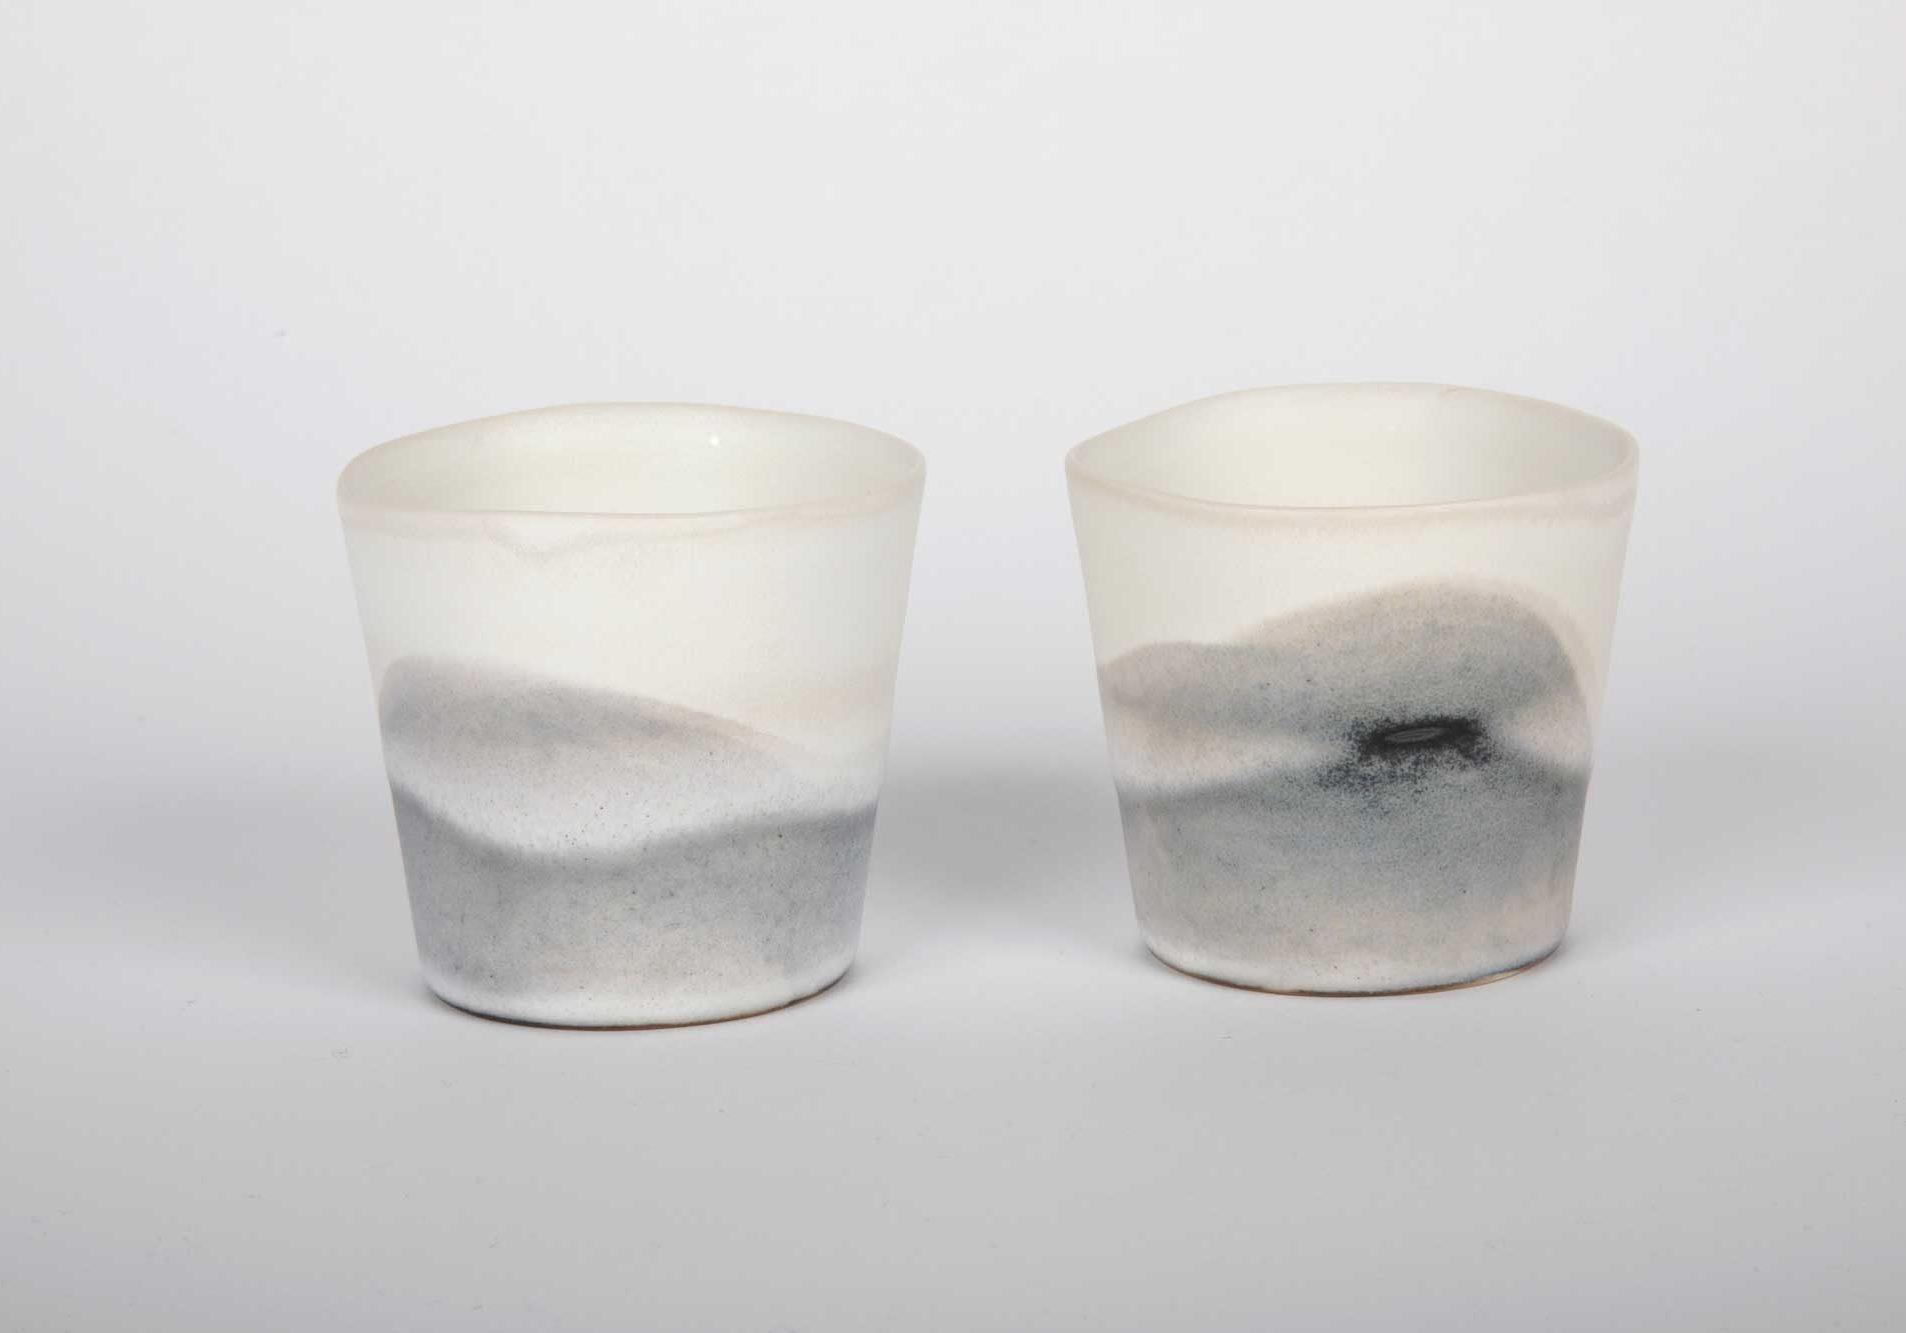 Duo de gobelets Aline Lafollie